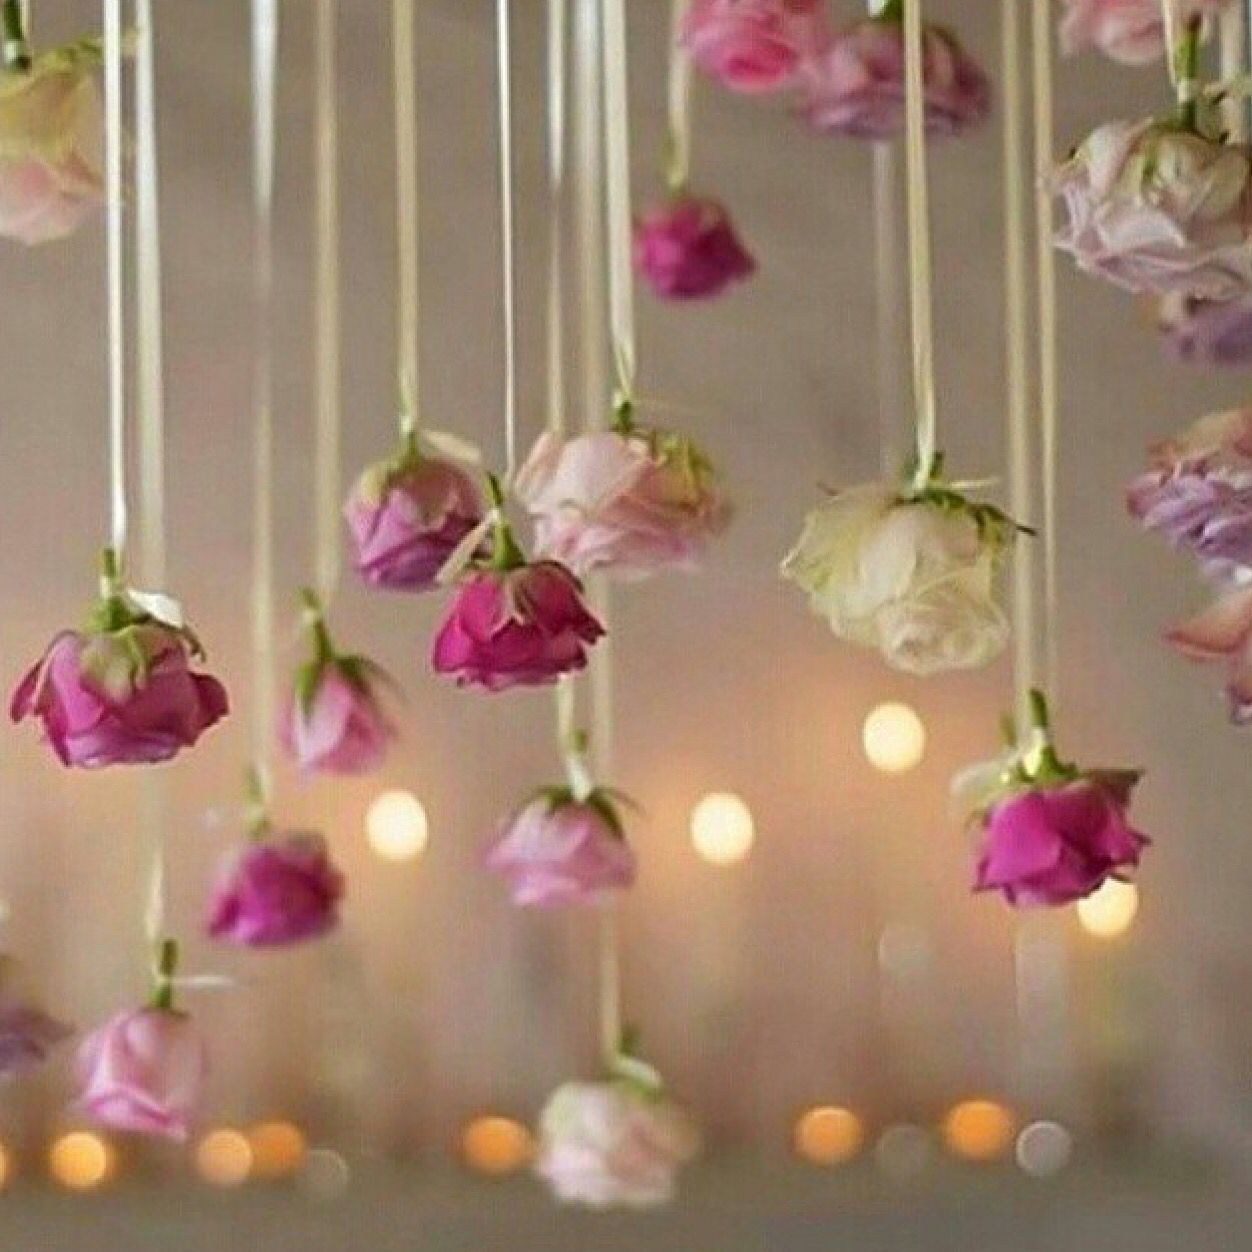 50 Beautiful Hanging Floral Wedding Decoration Ideas Beauty Of Wedding Floral Wedding Decorations Flower Decorations Hanging Flowers